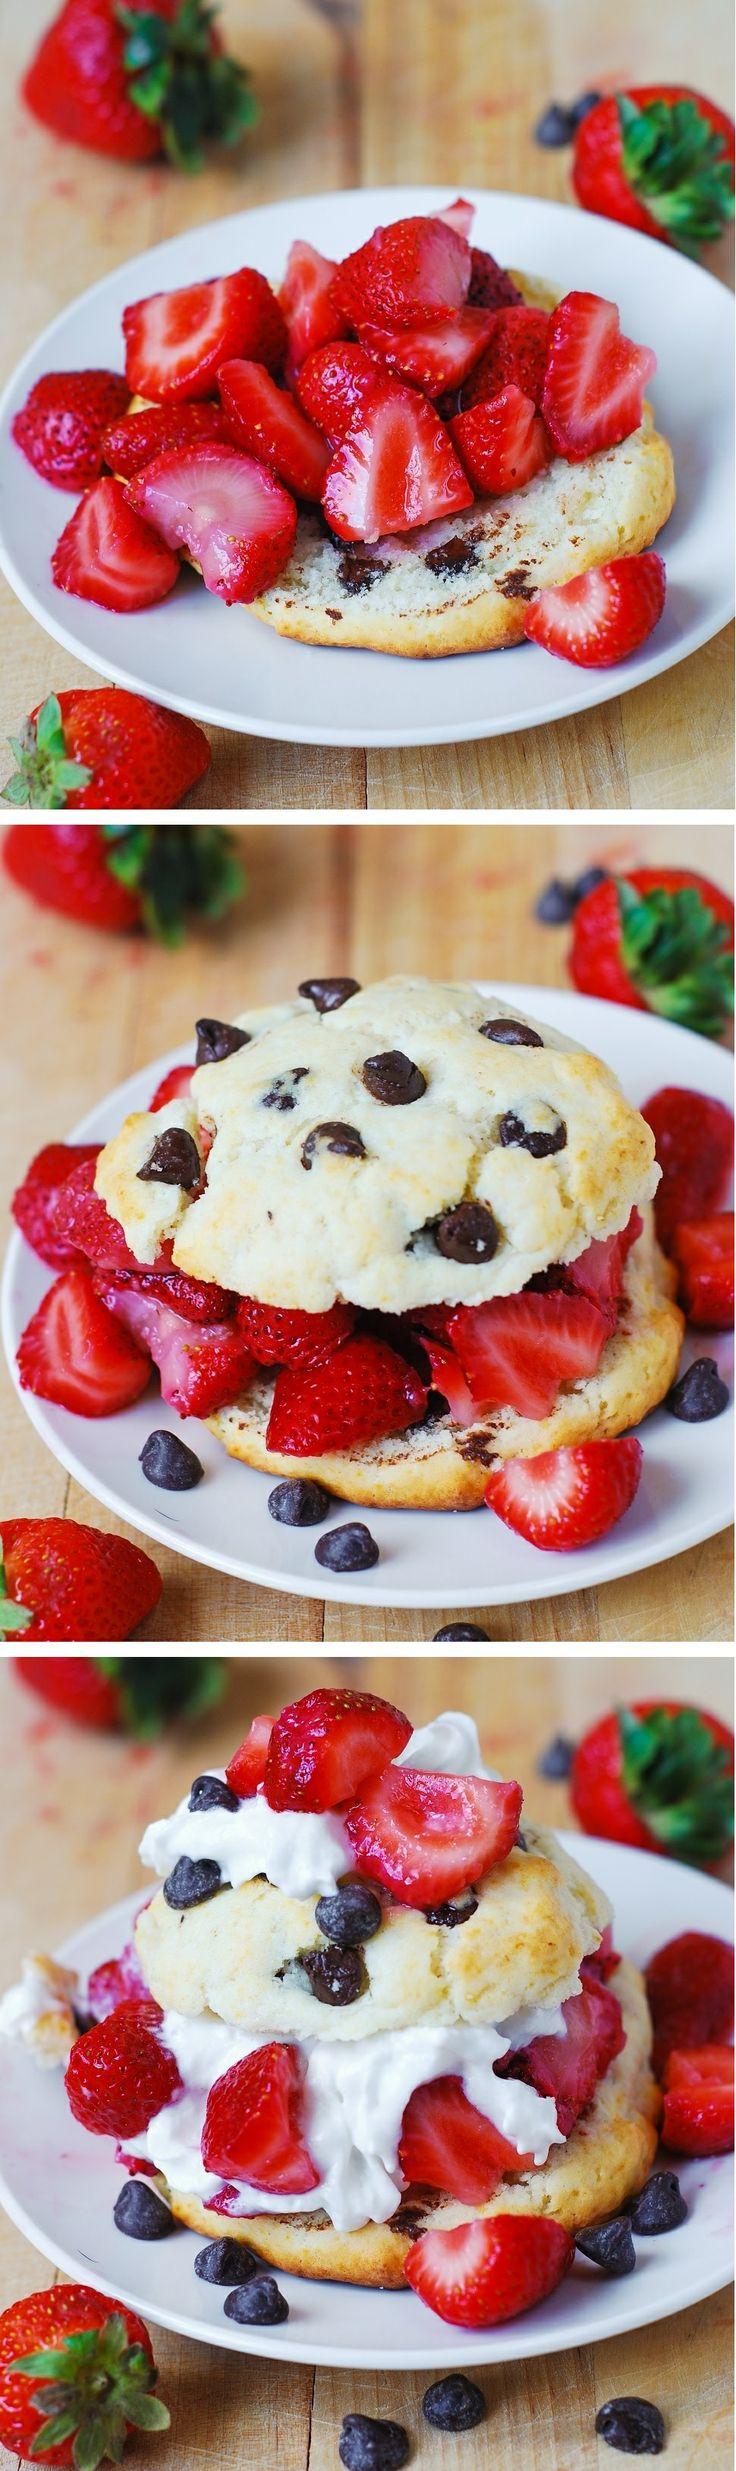 Chocolate chip strawberry shortcakes